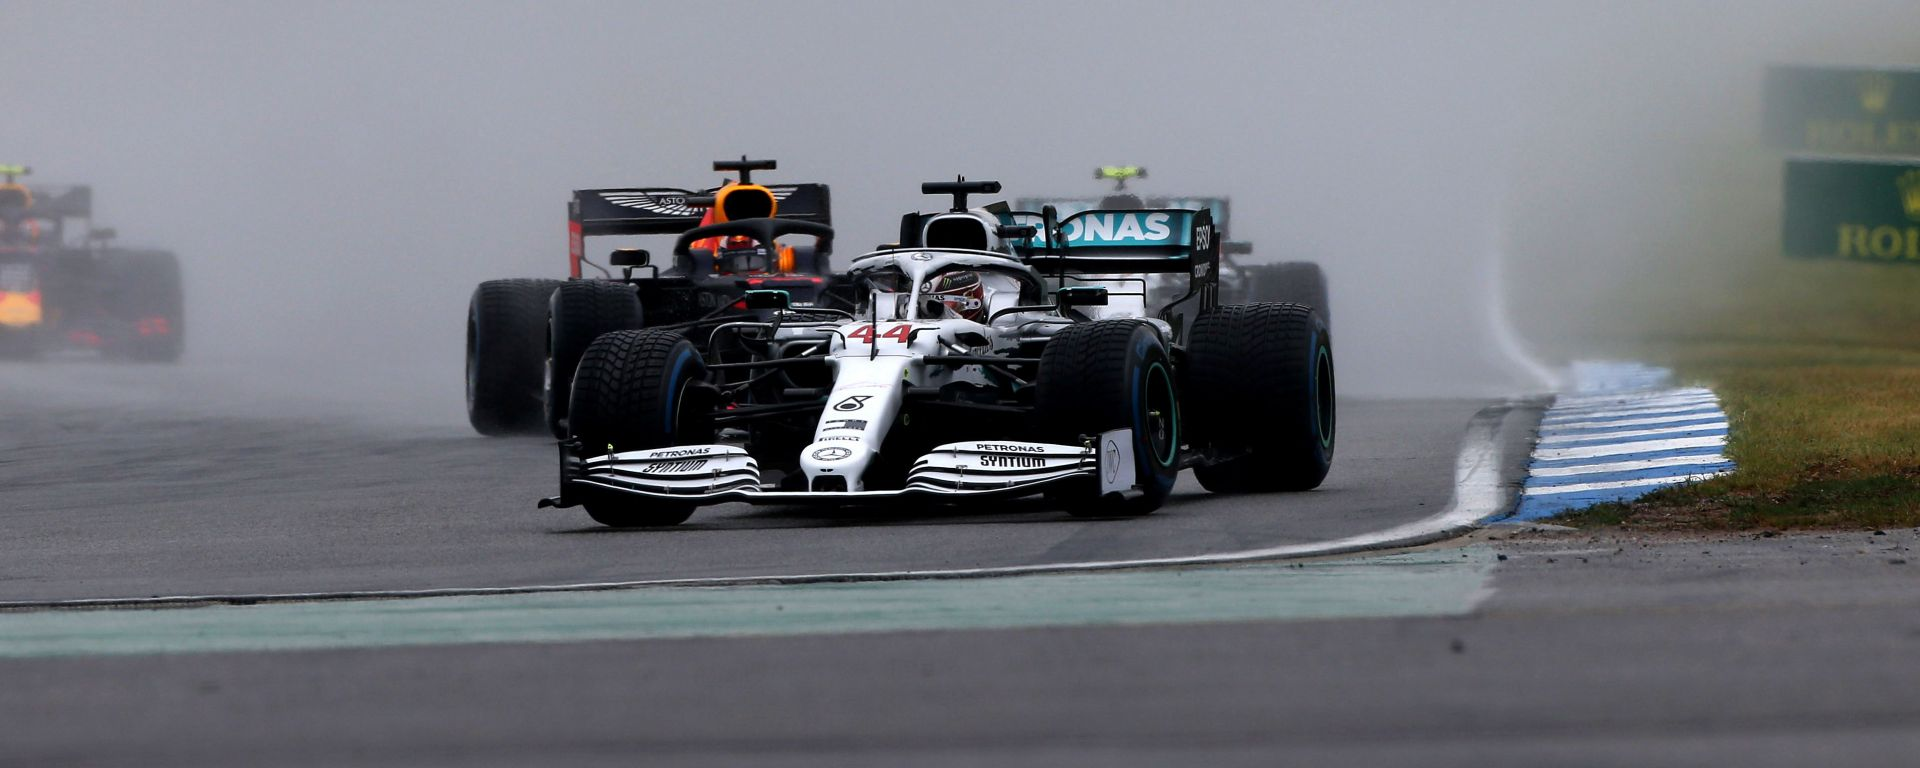 Hamilton (Mercedes) su pista bagnata in Germania